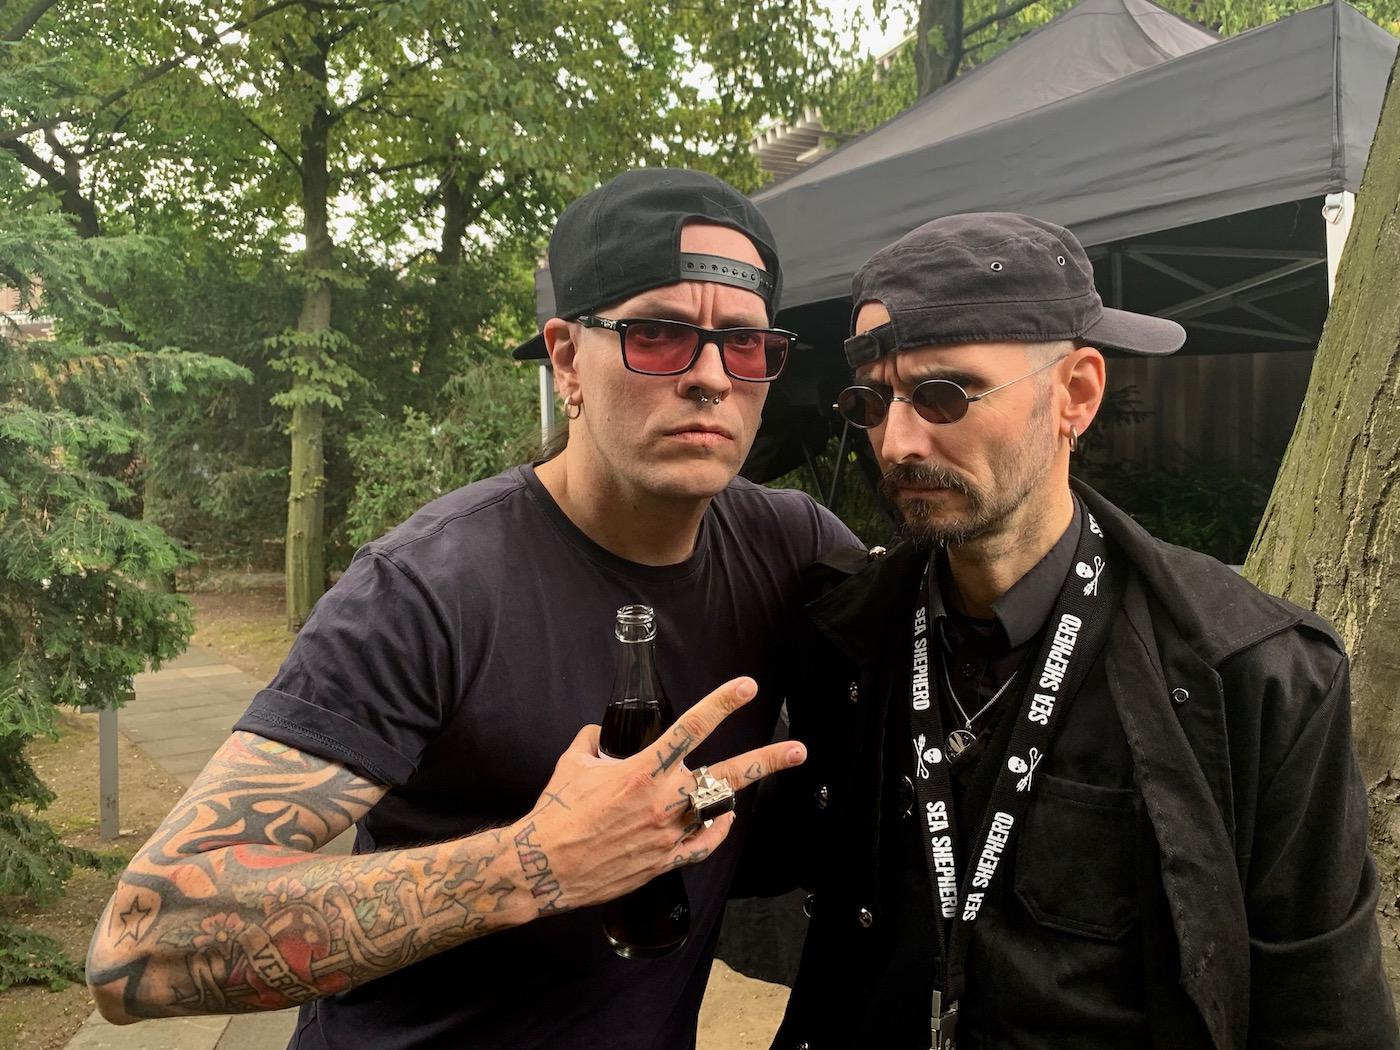 mark_benecke_amphi_festival_koeln_2019 - 13.jpg